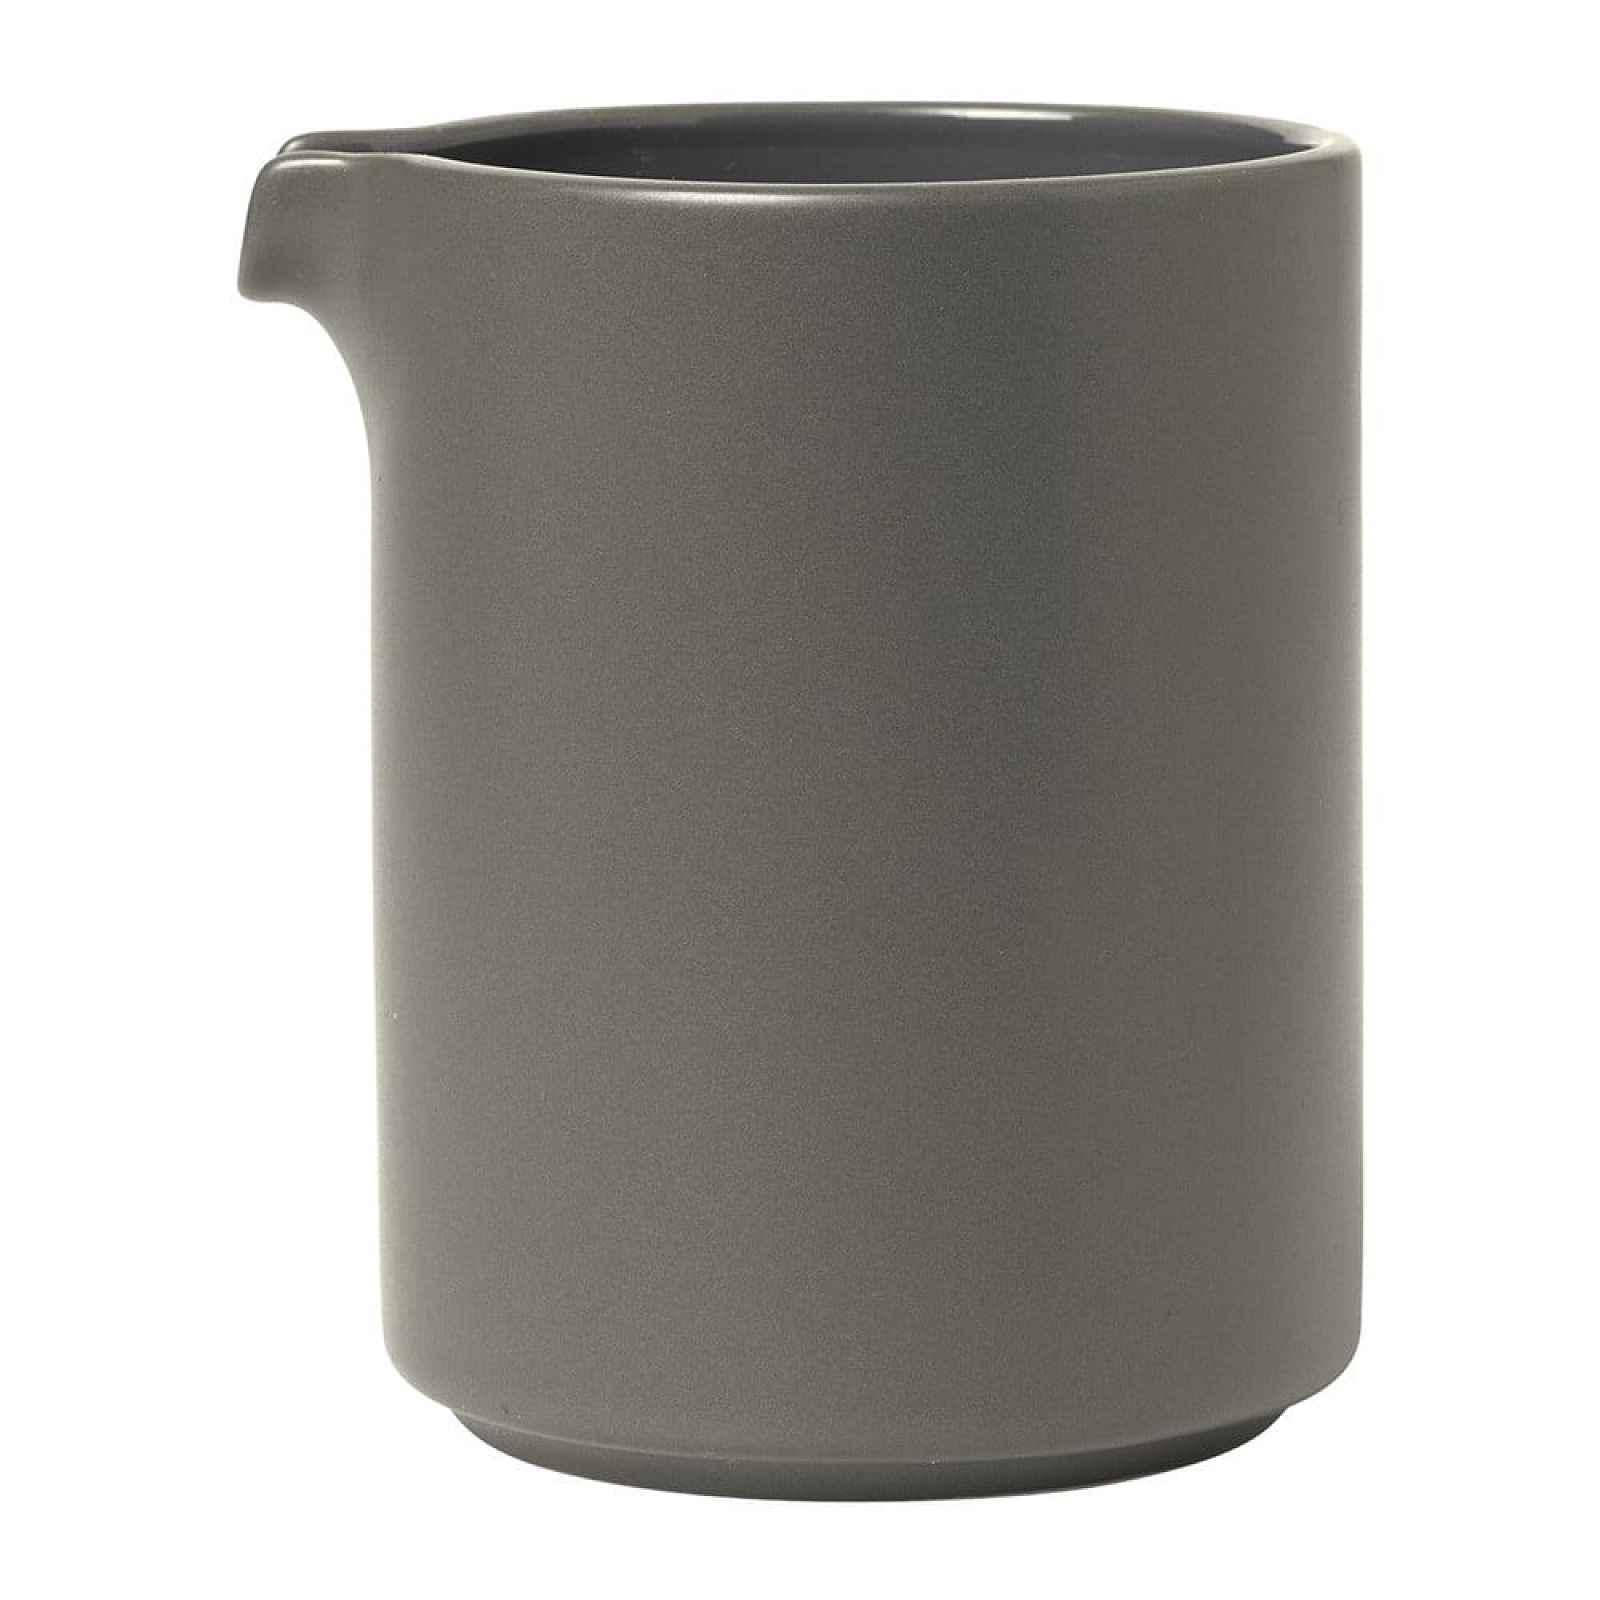 Šedá keramická mléčenka Blomus Pilar,280 ml